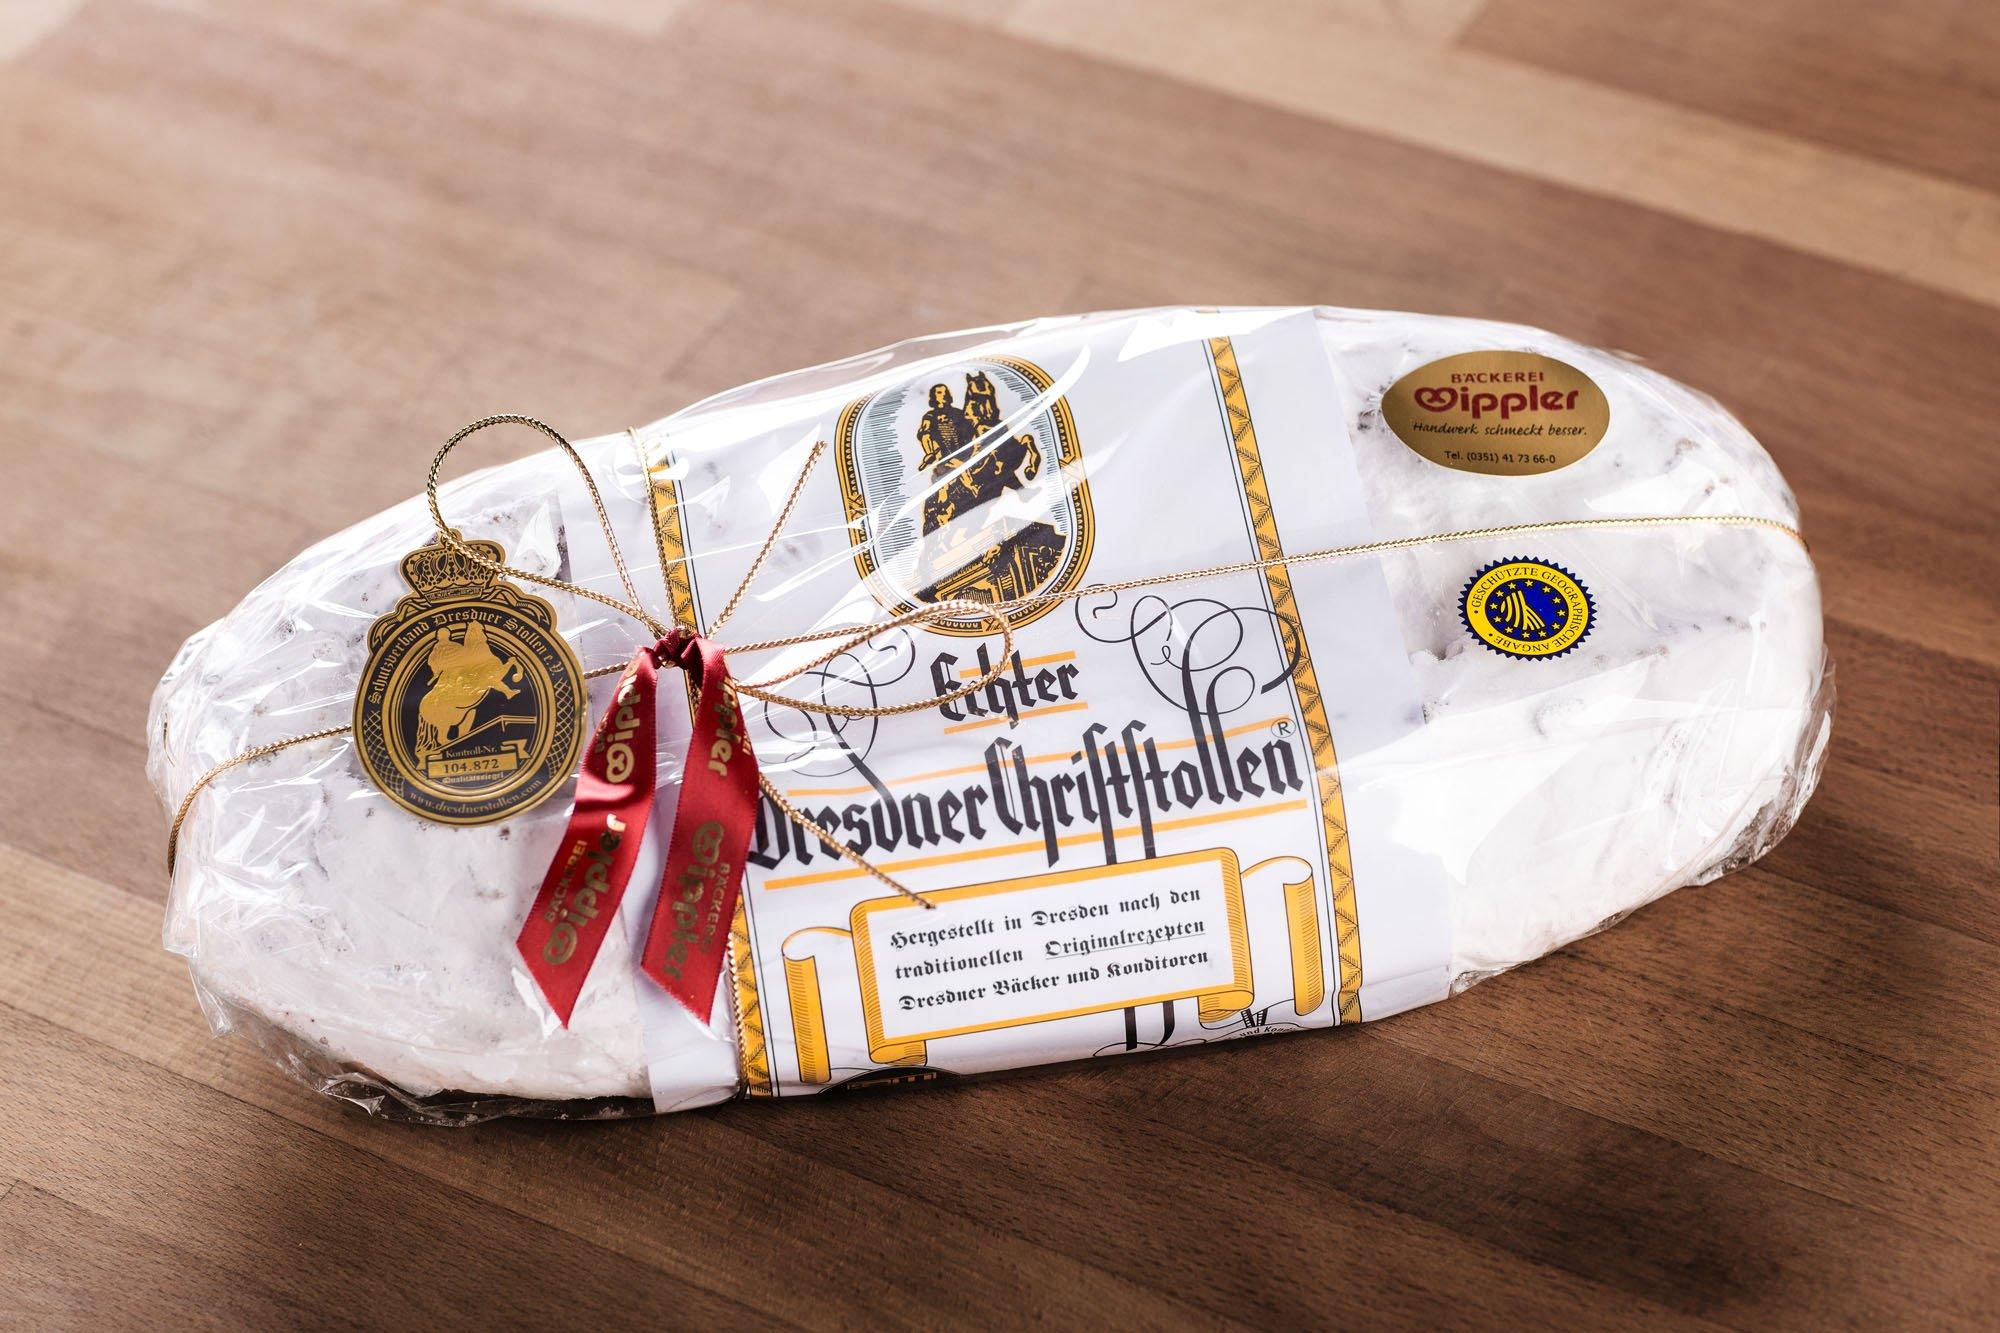 Wipplers Dresdner Christstollen 2 kg